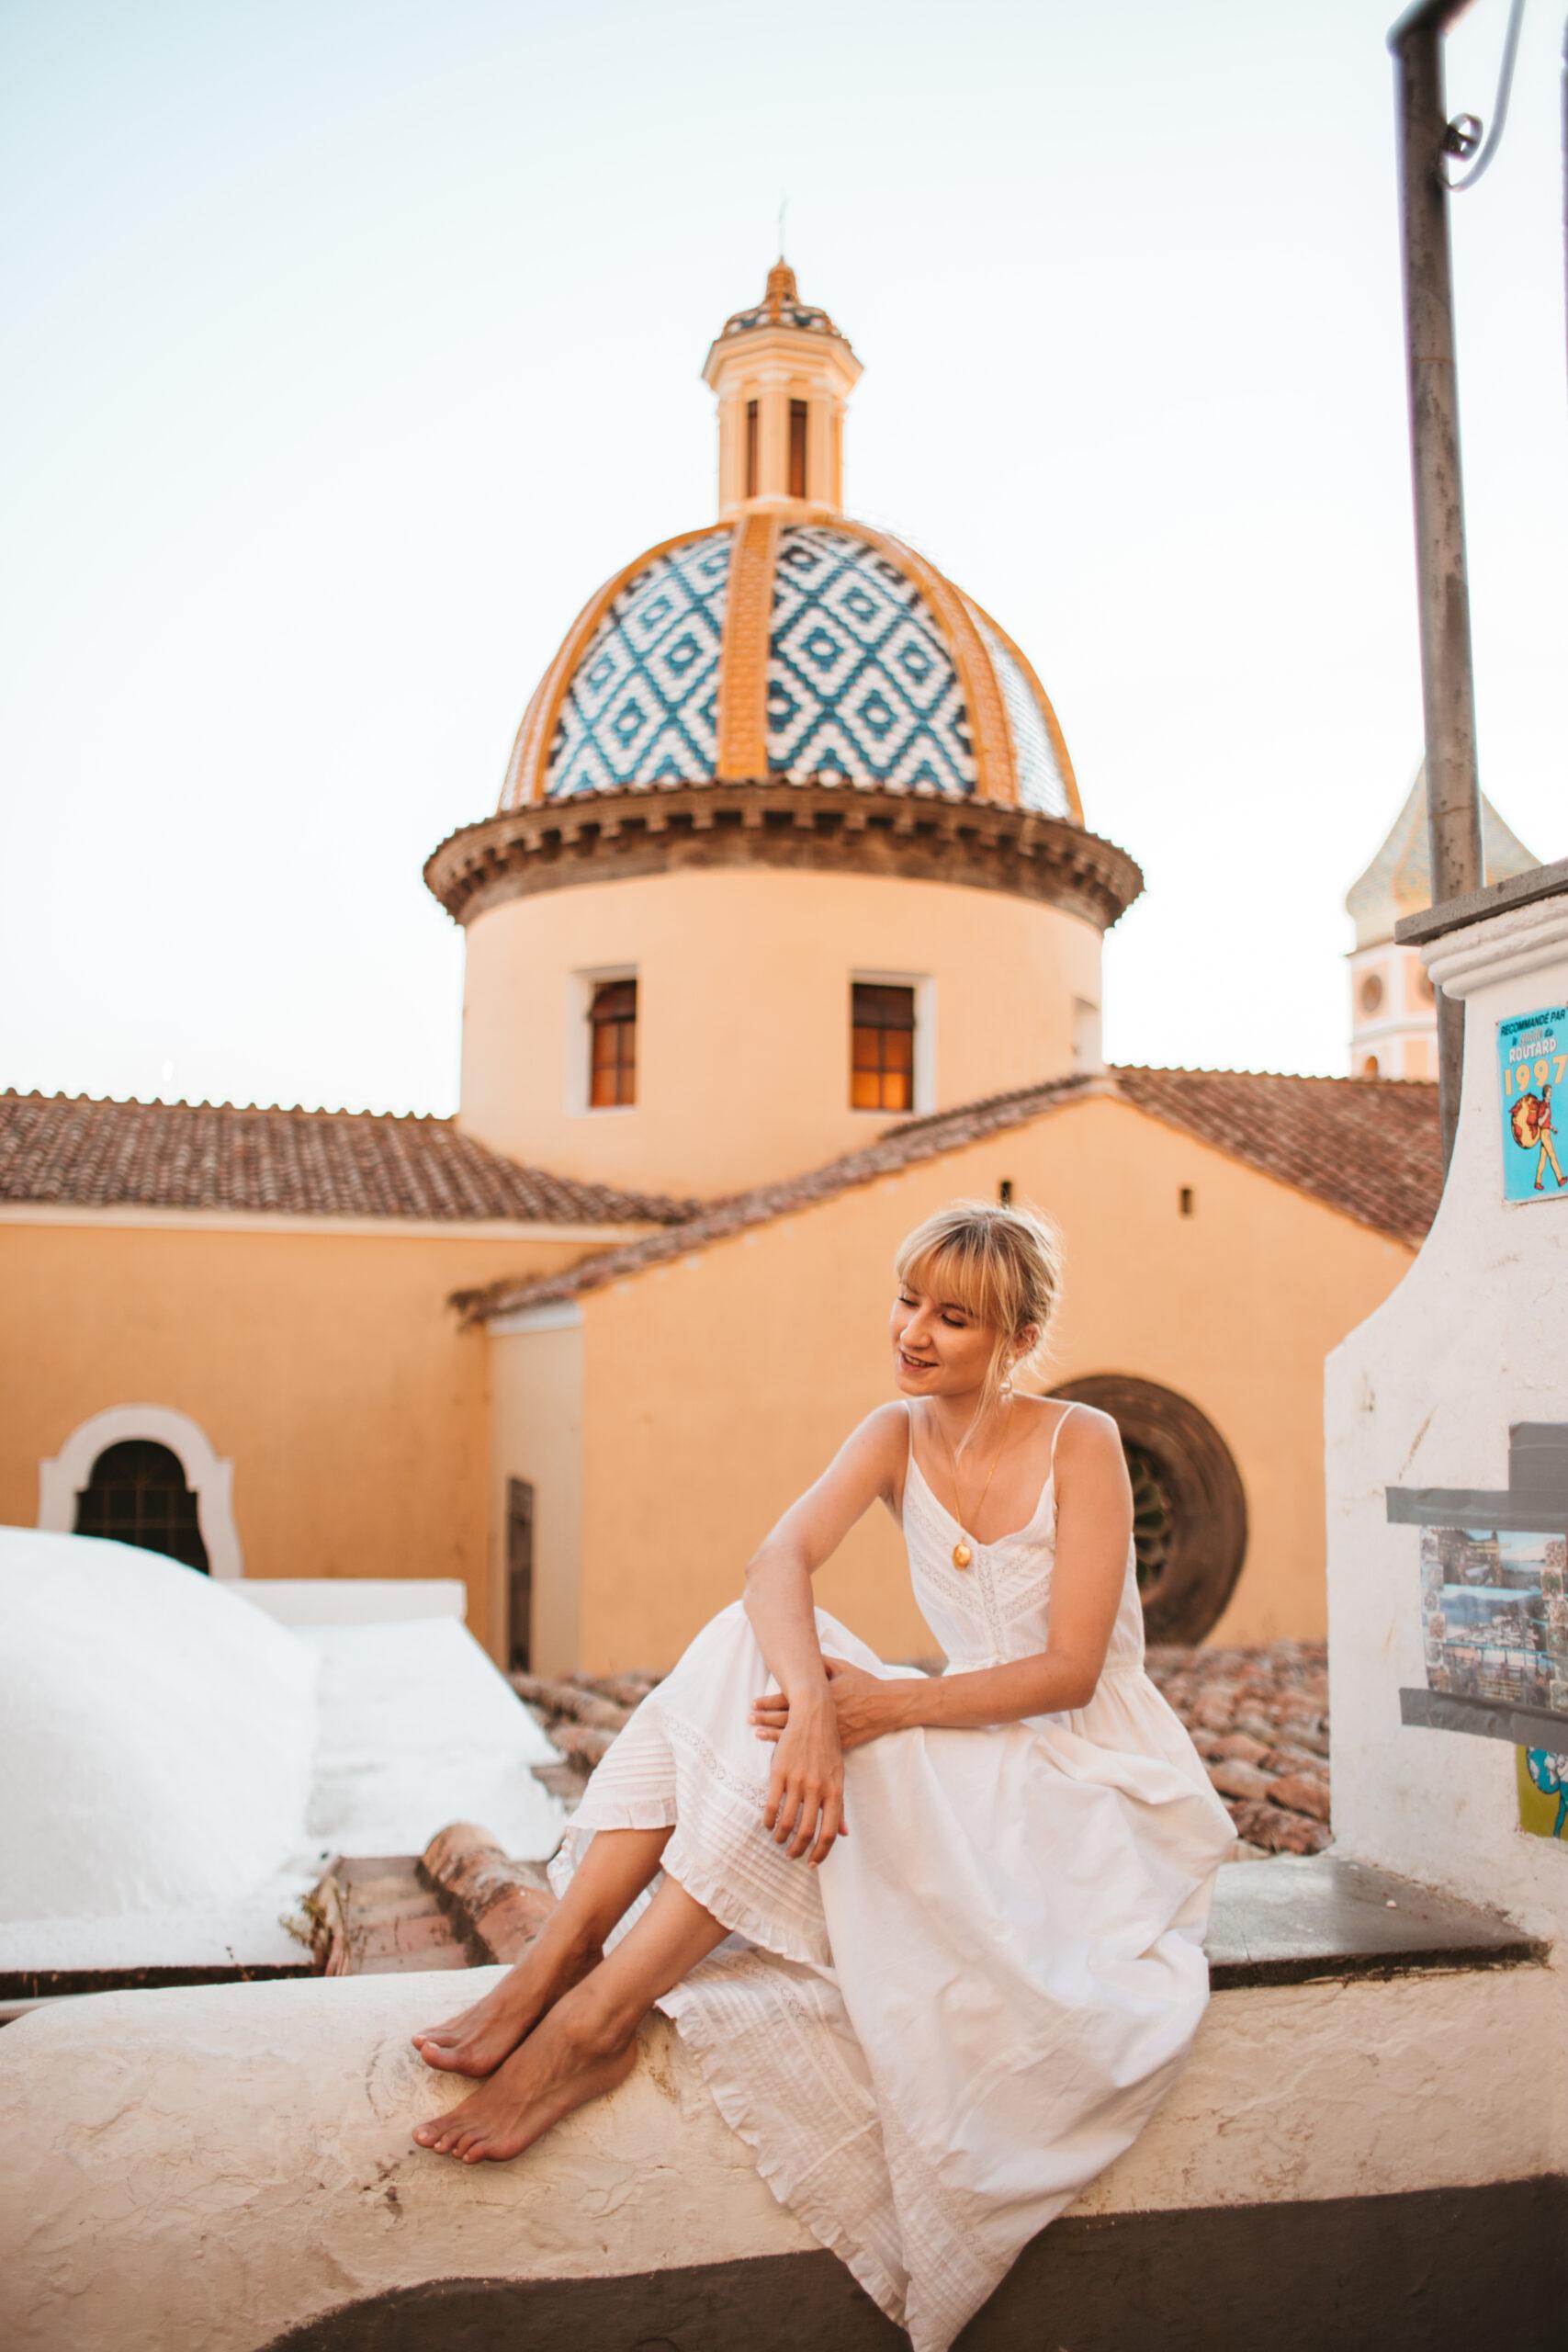 praiano amalfi coast, positano, girl in white dress, summer in Italy, Italy vacations